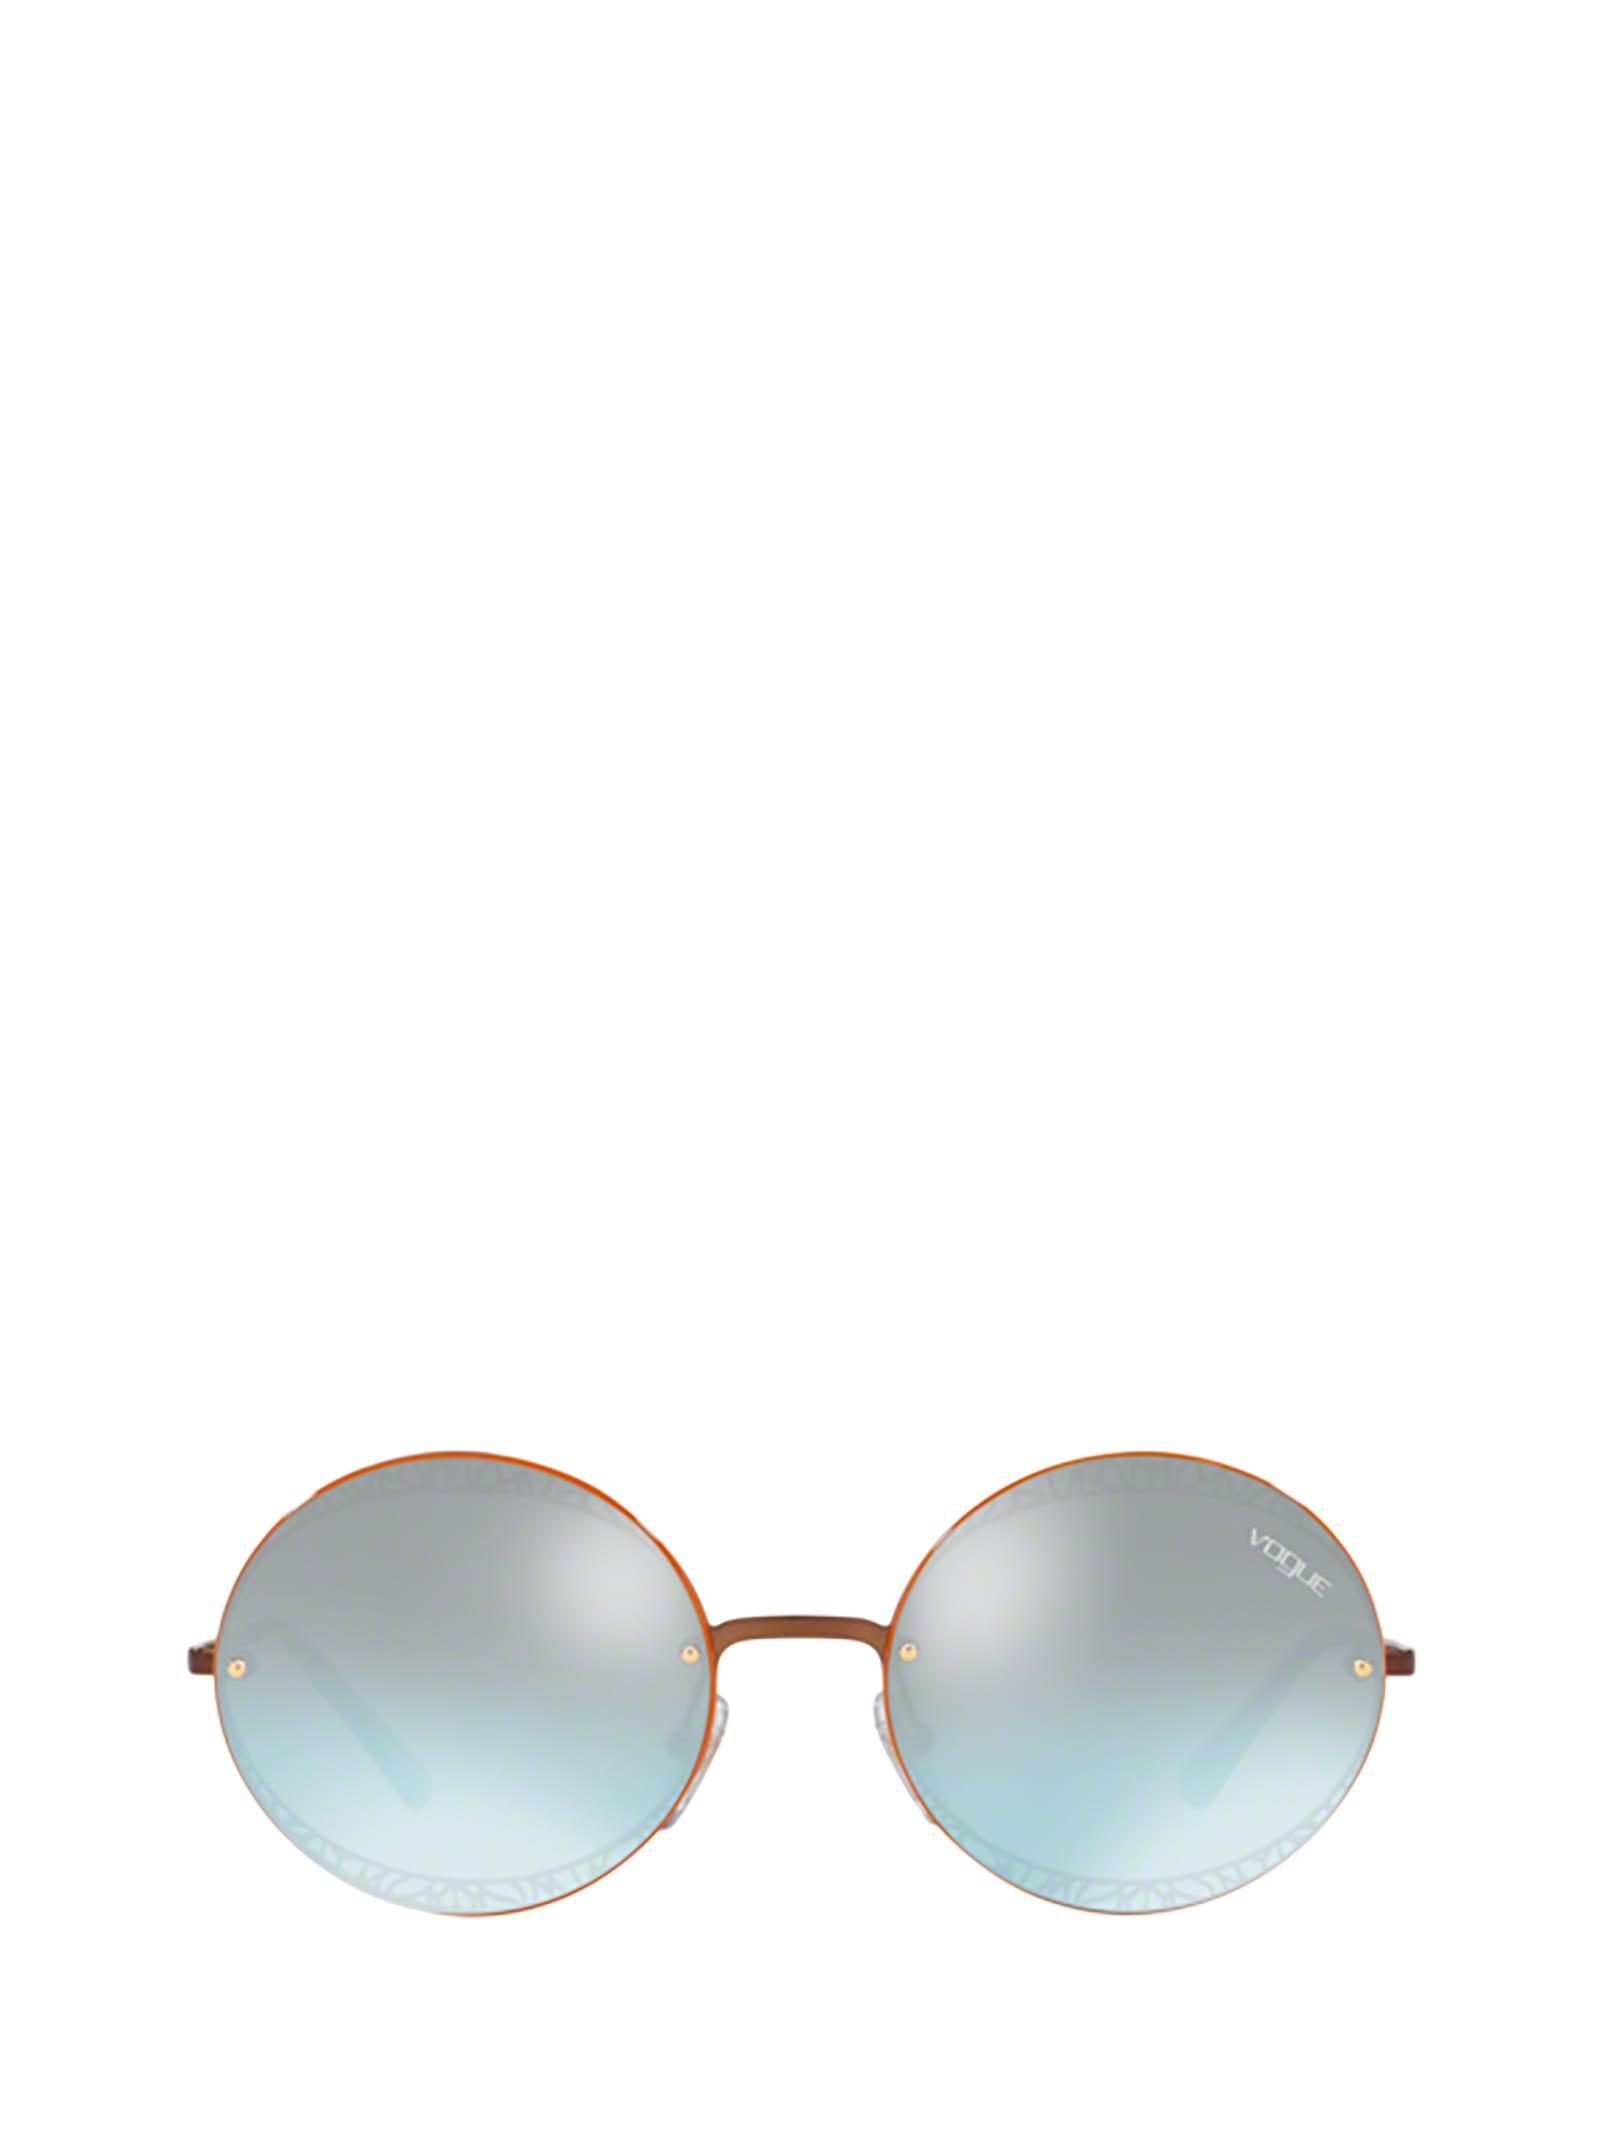 Vogue Eyewear Vogue Vo4118s 50747c Sunglasses